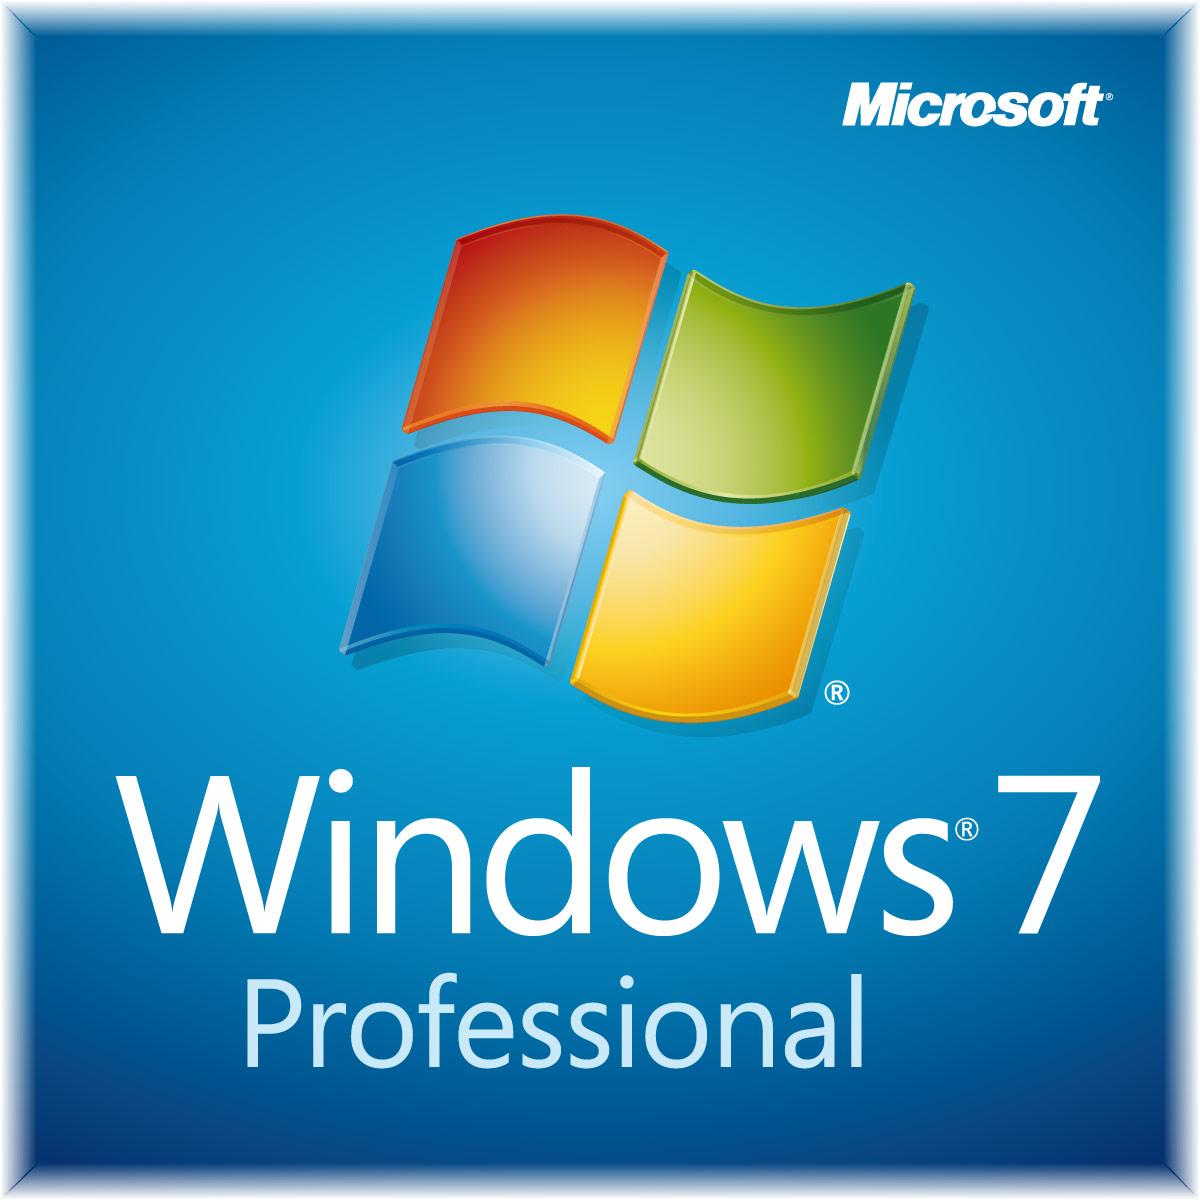 Windows xp professional gold soft 2017 sp2